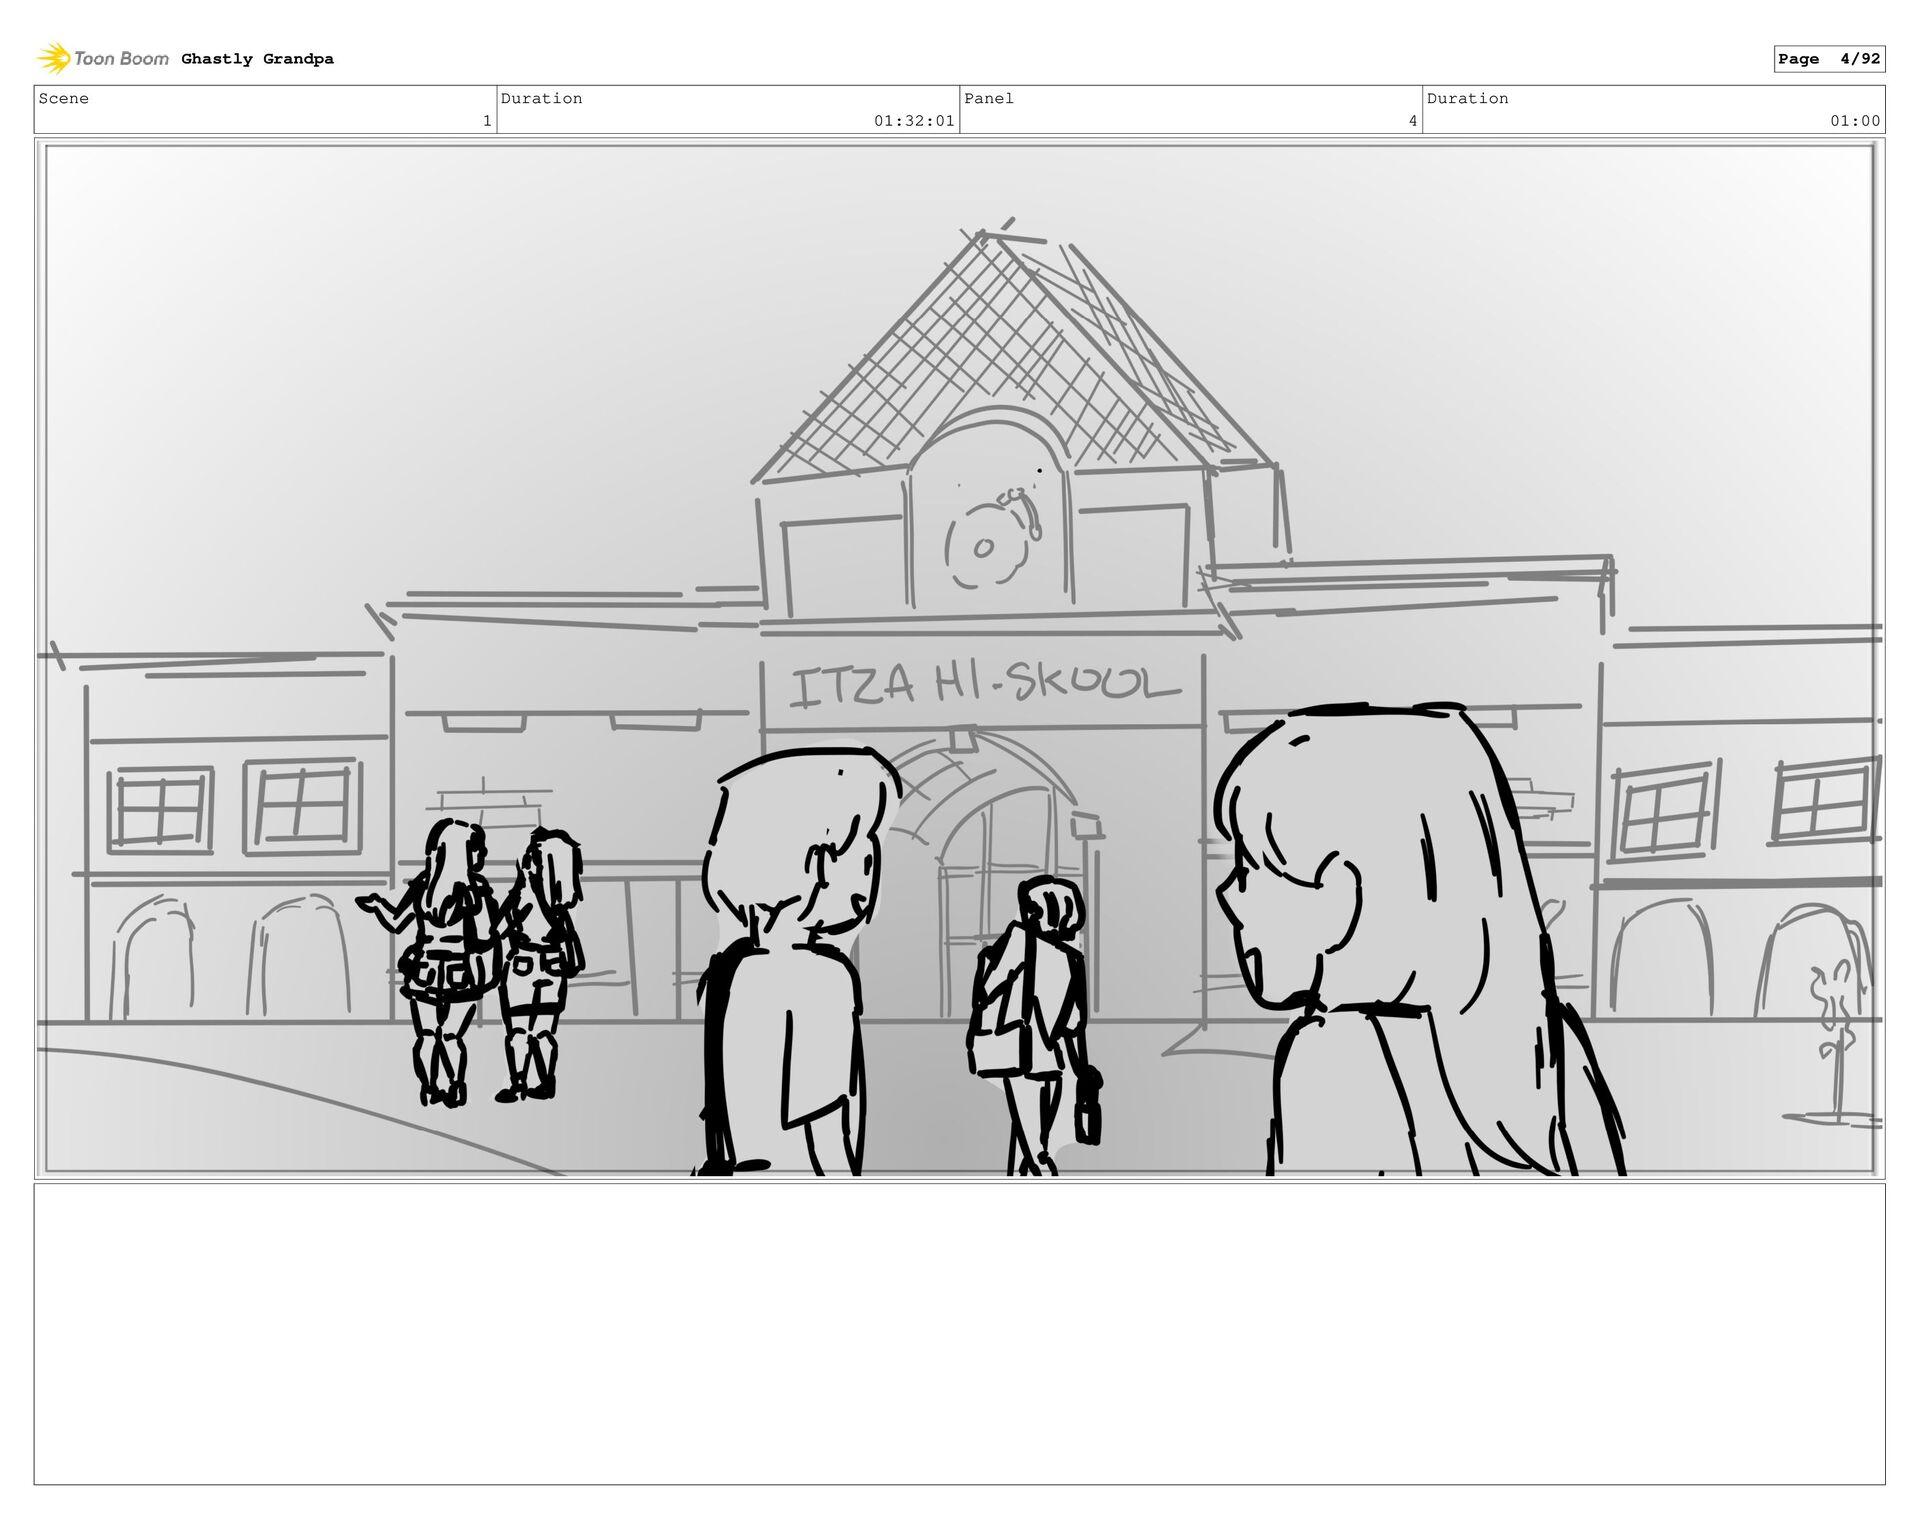 Scene 1 Duration 01:27:01 Panel 3 Duration 01:0...